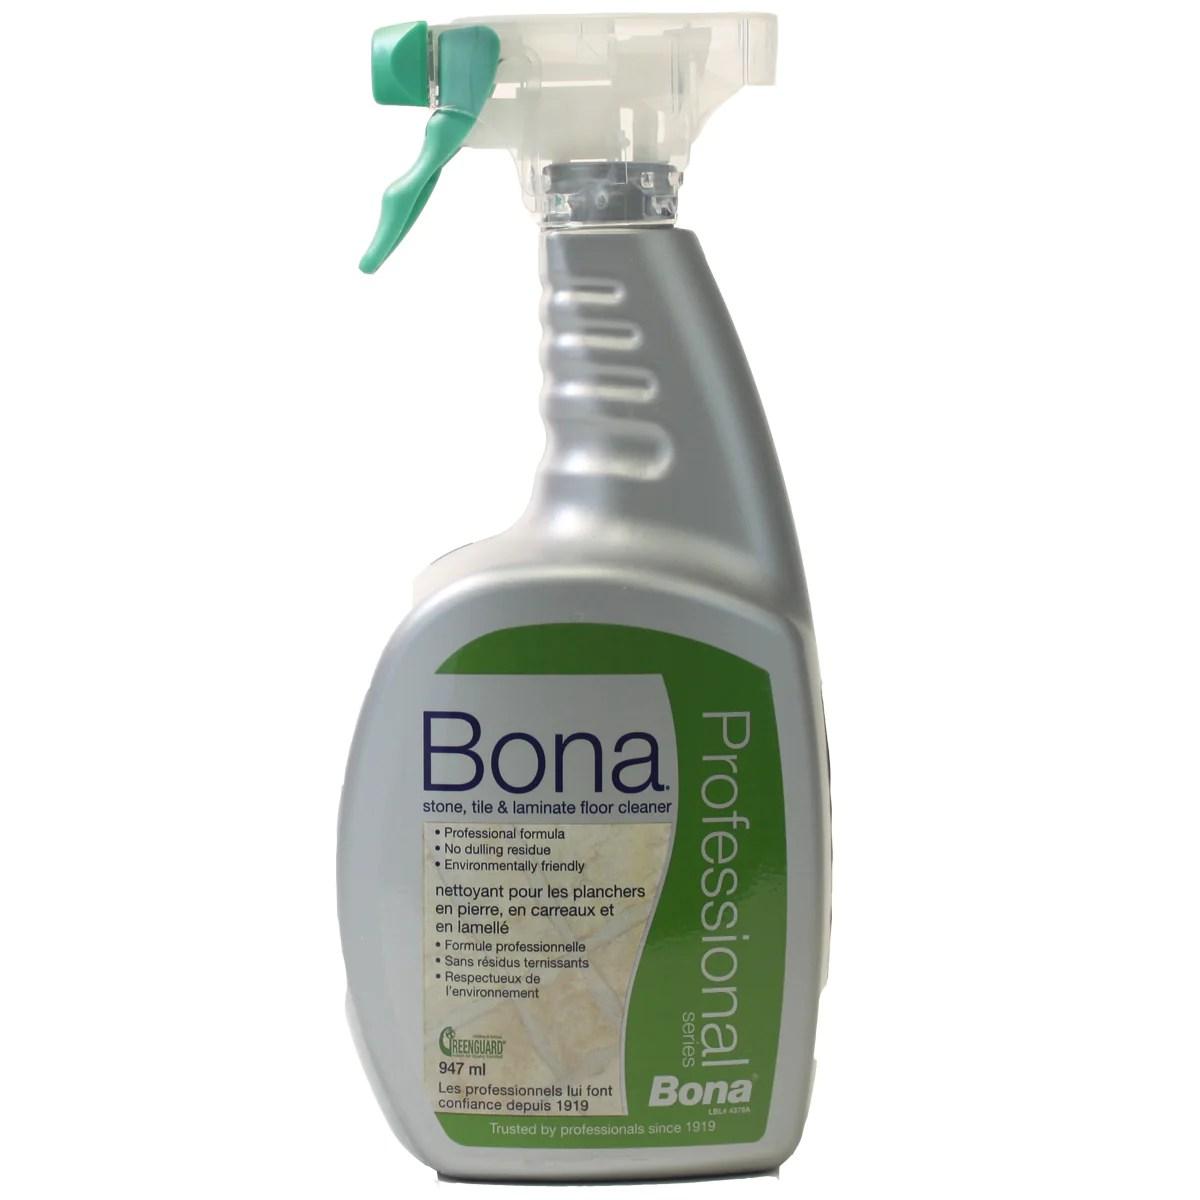 bona stone tile and laminate floor cleaner pro series spray 32oz